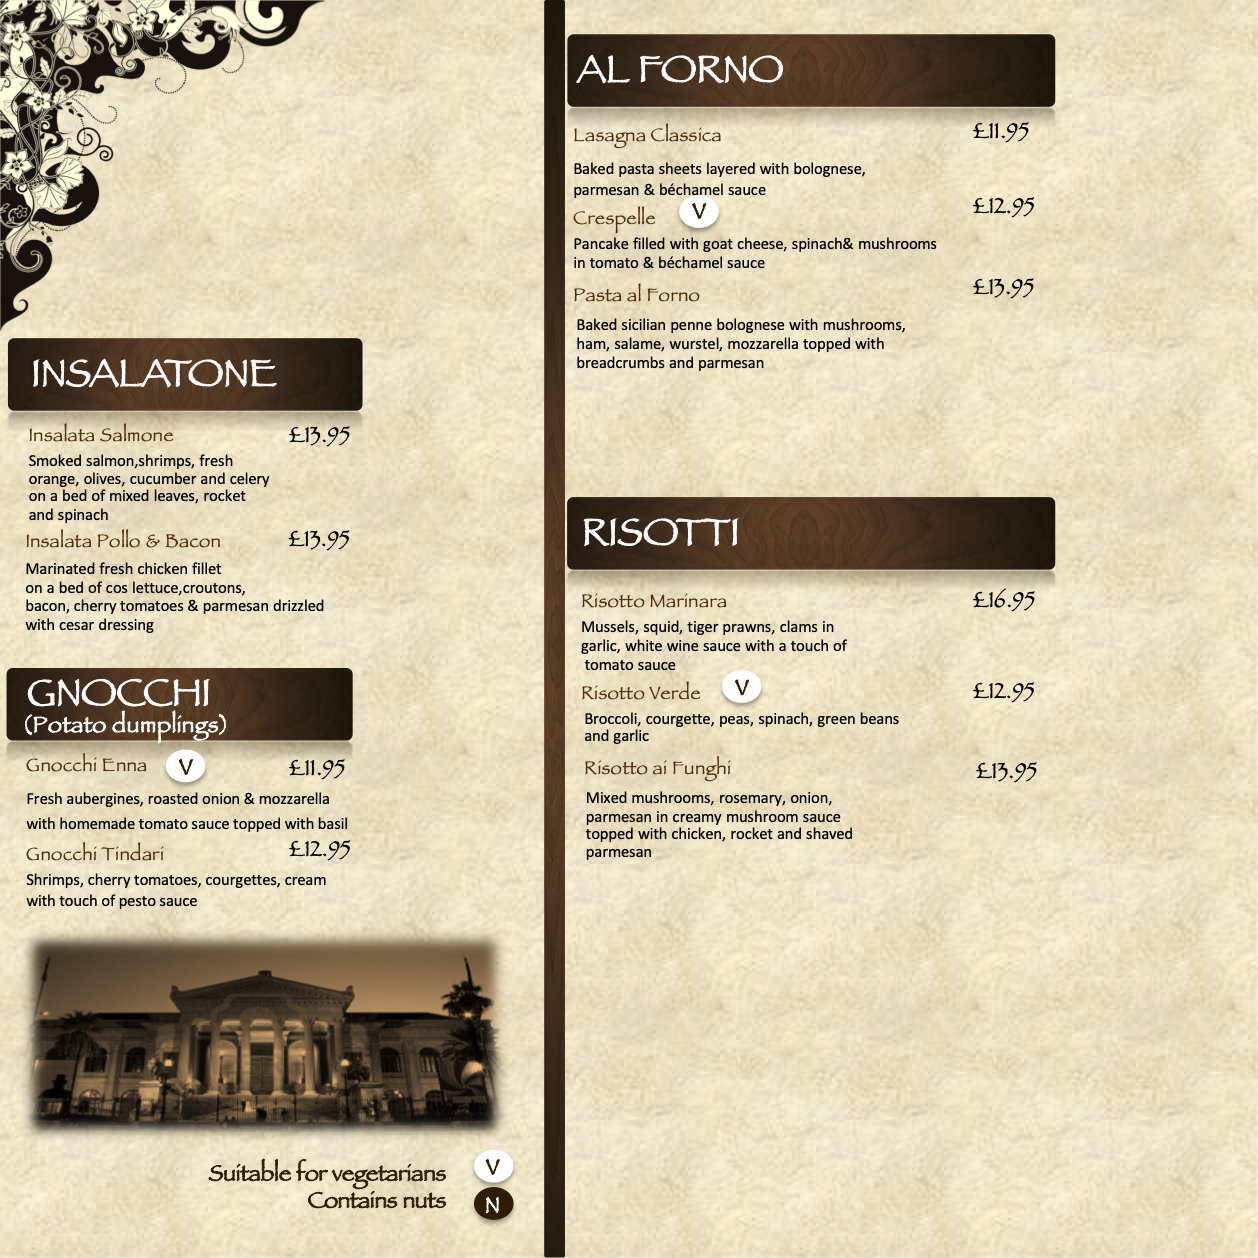 menu 2020 sicily6